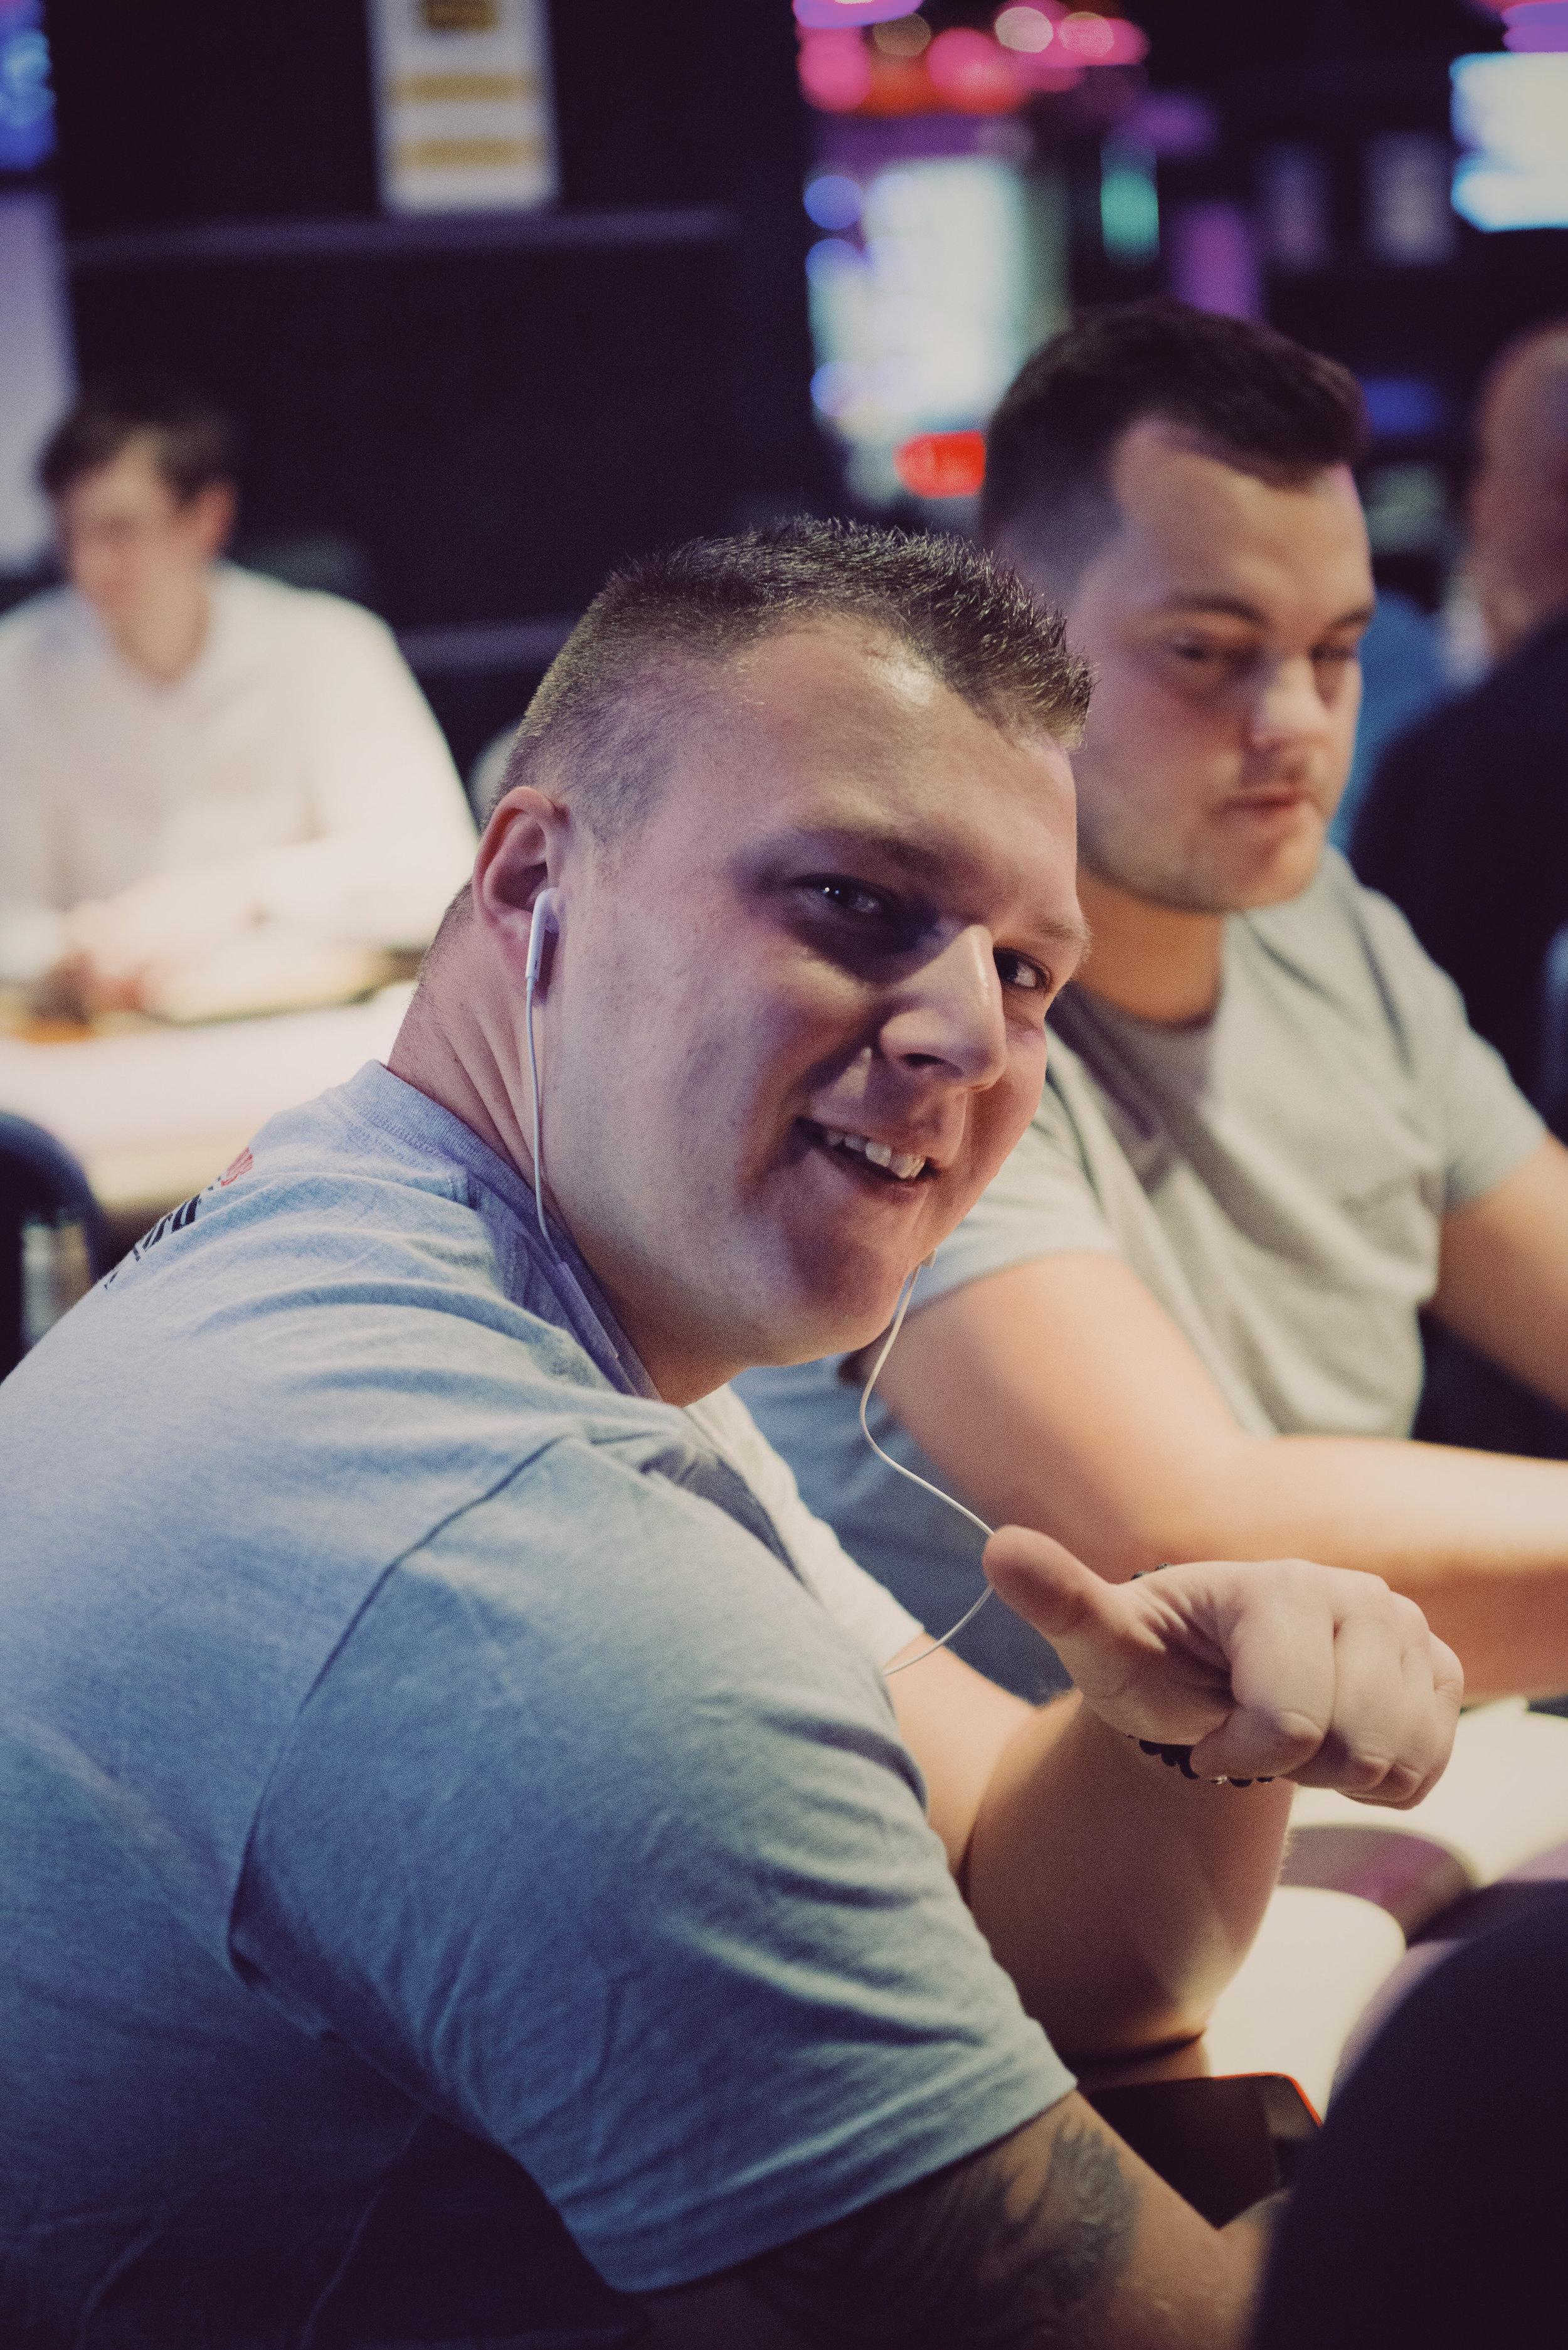 Poker-Photography-Europe-Polina-Shubkina-Casino-RebuyStars-019.JPG